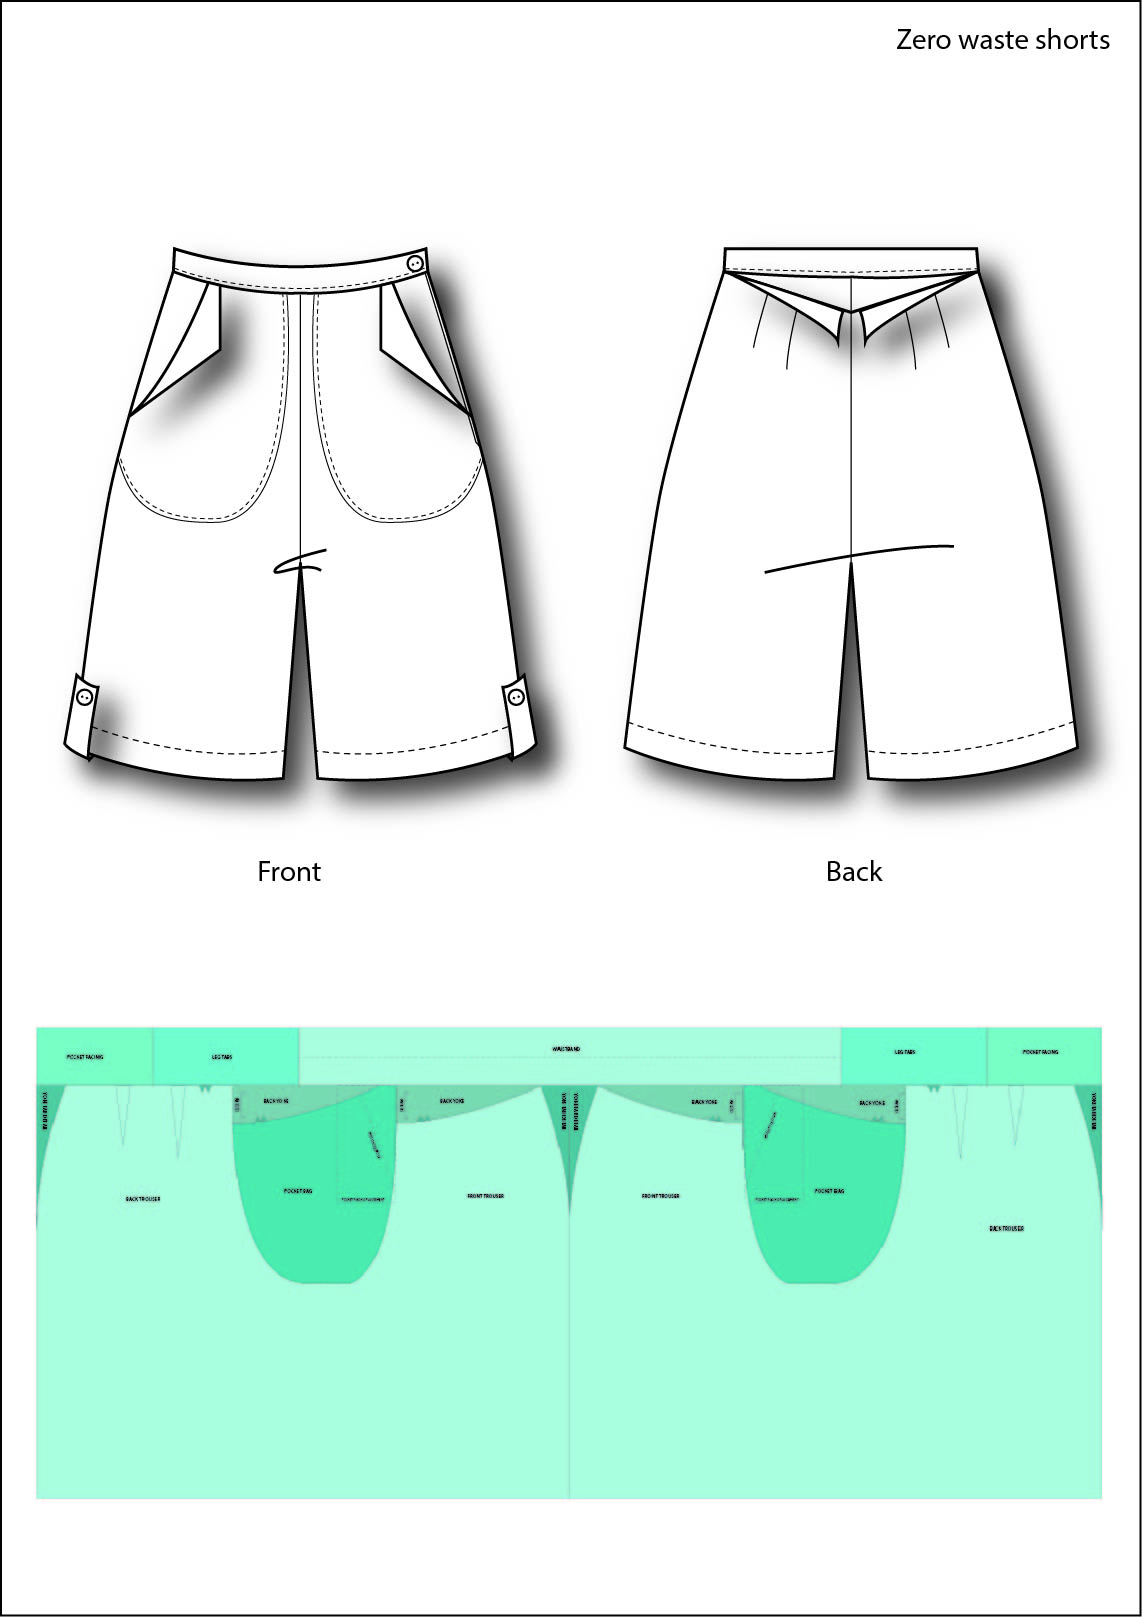 Tech drawing and pattern layout